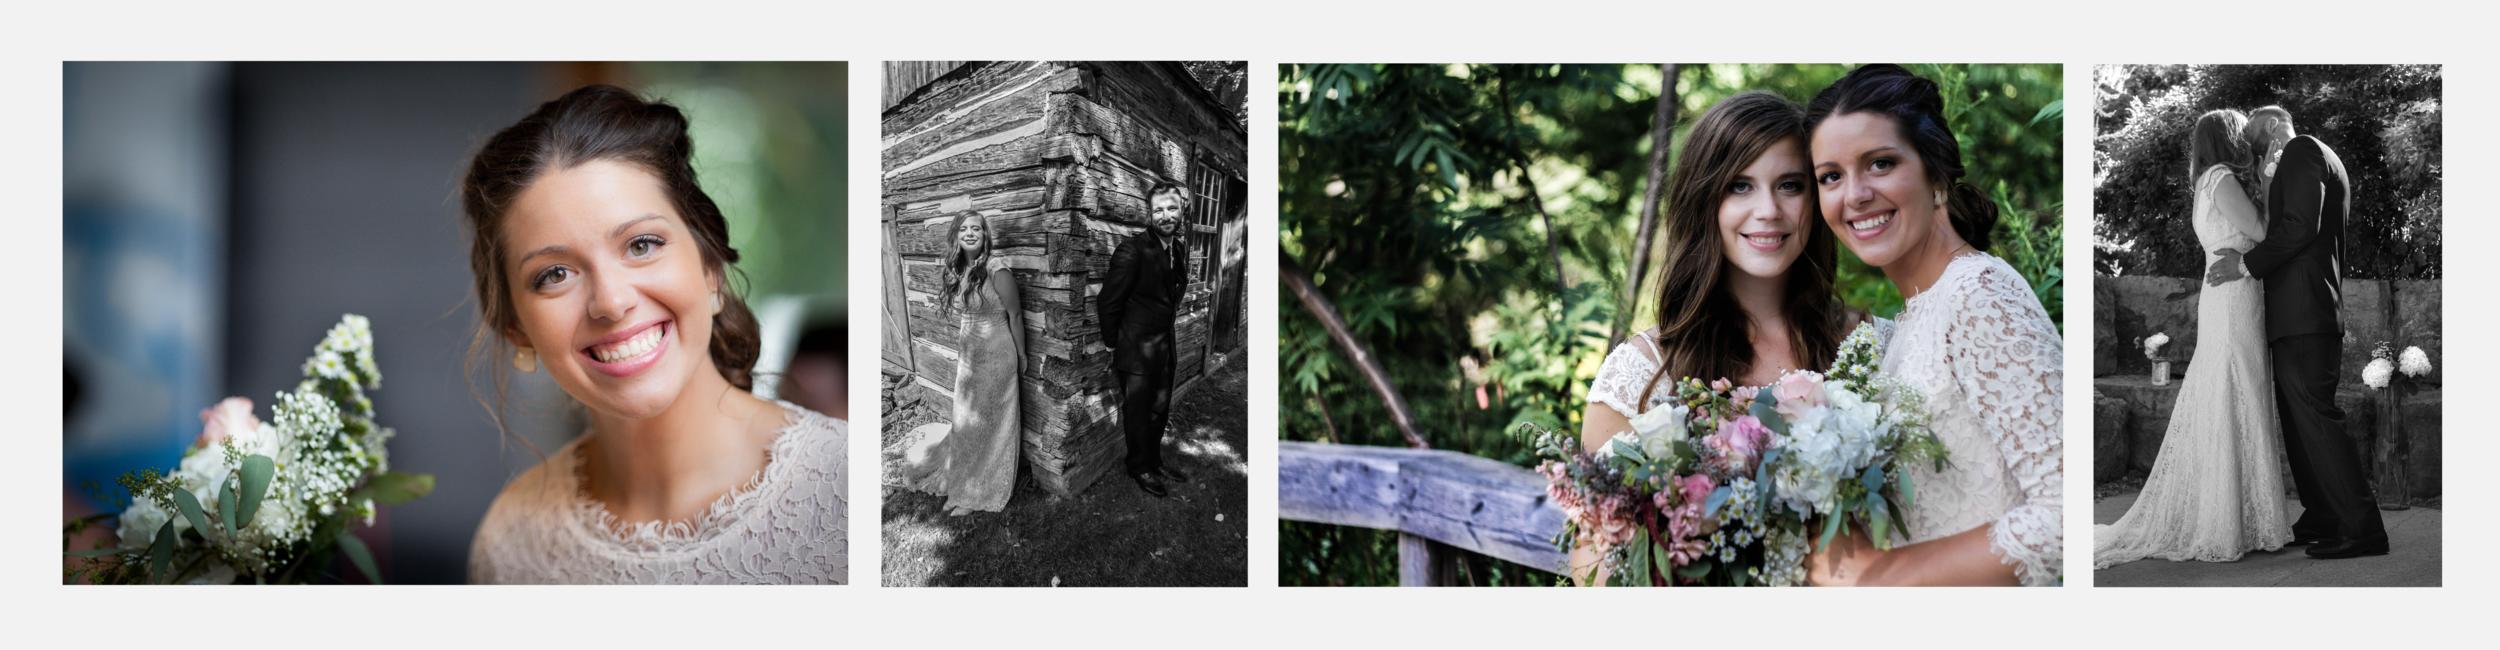 wedding toronto photo video